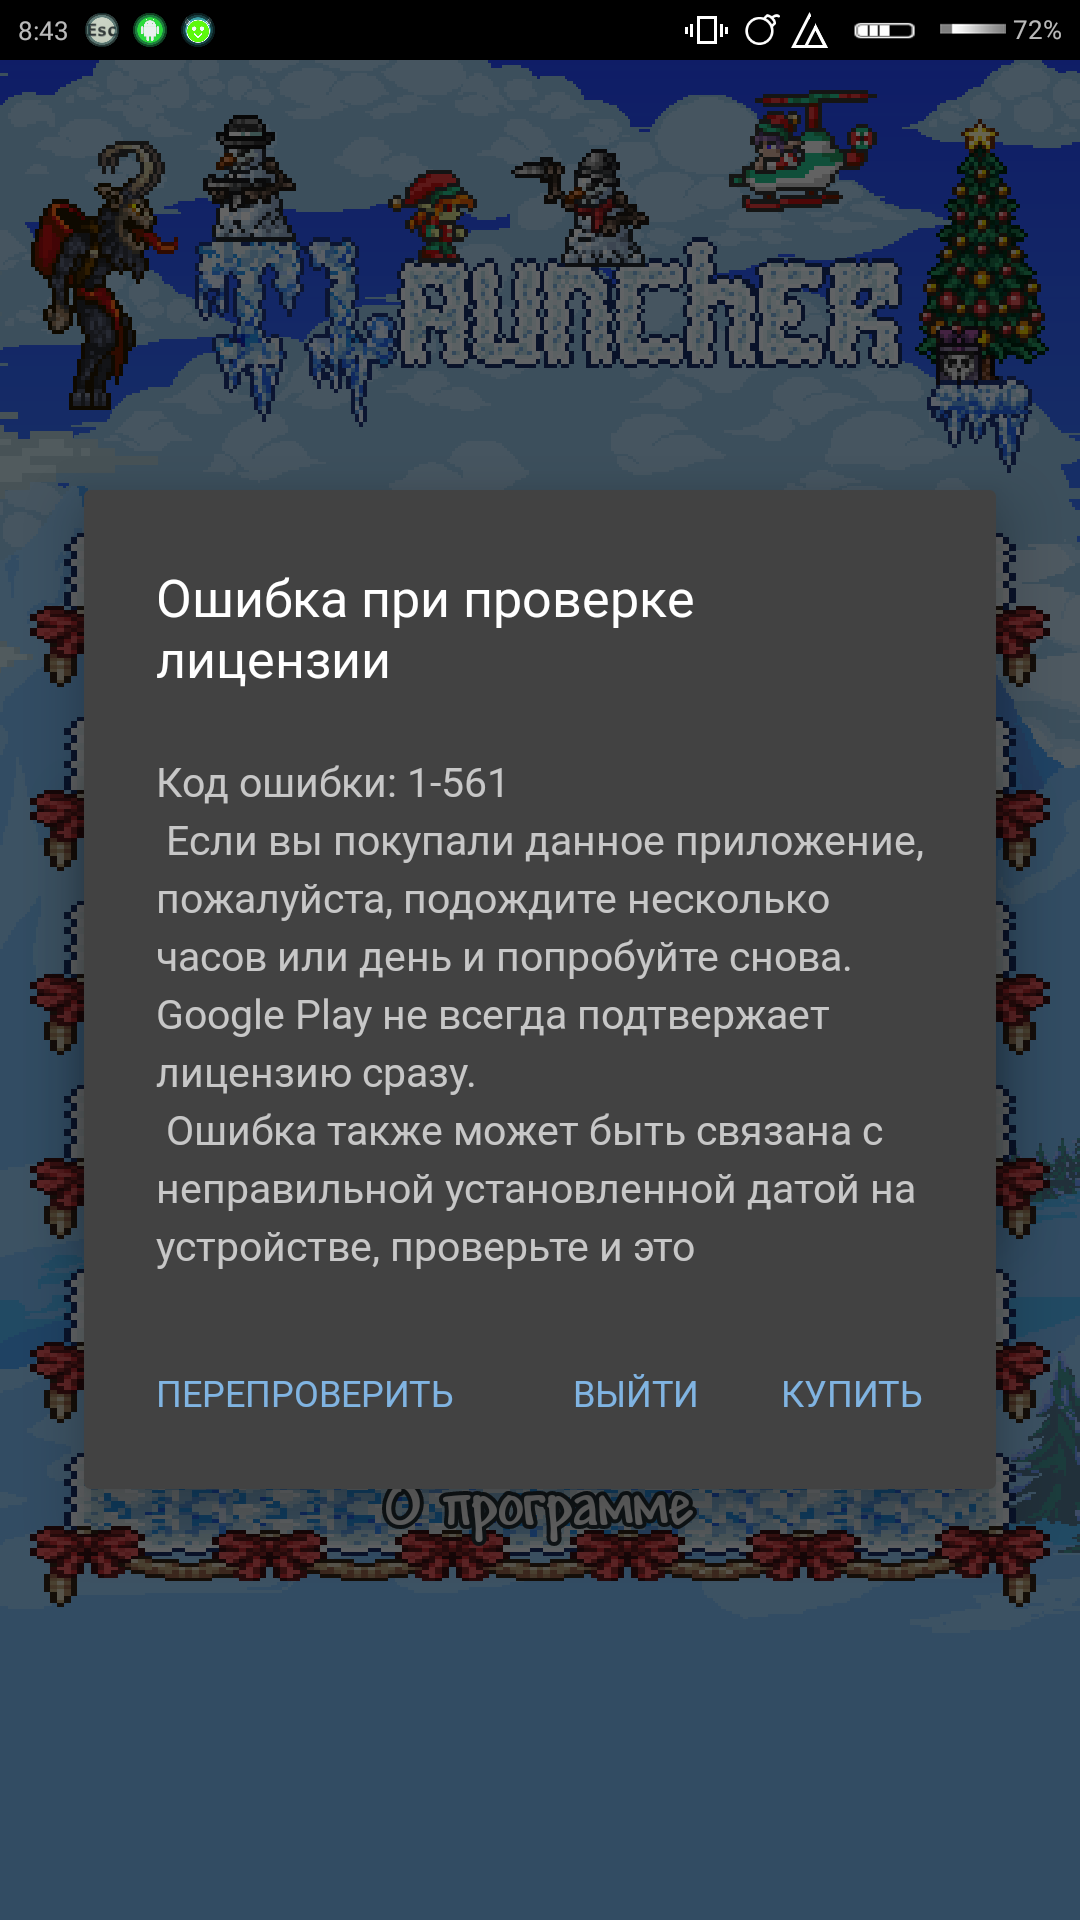 TL Mods Mod apk download - Pixelcurves TL Mods Mod Apk 2 971